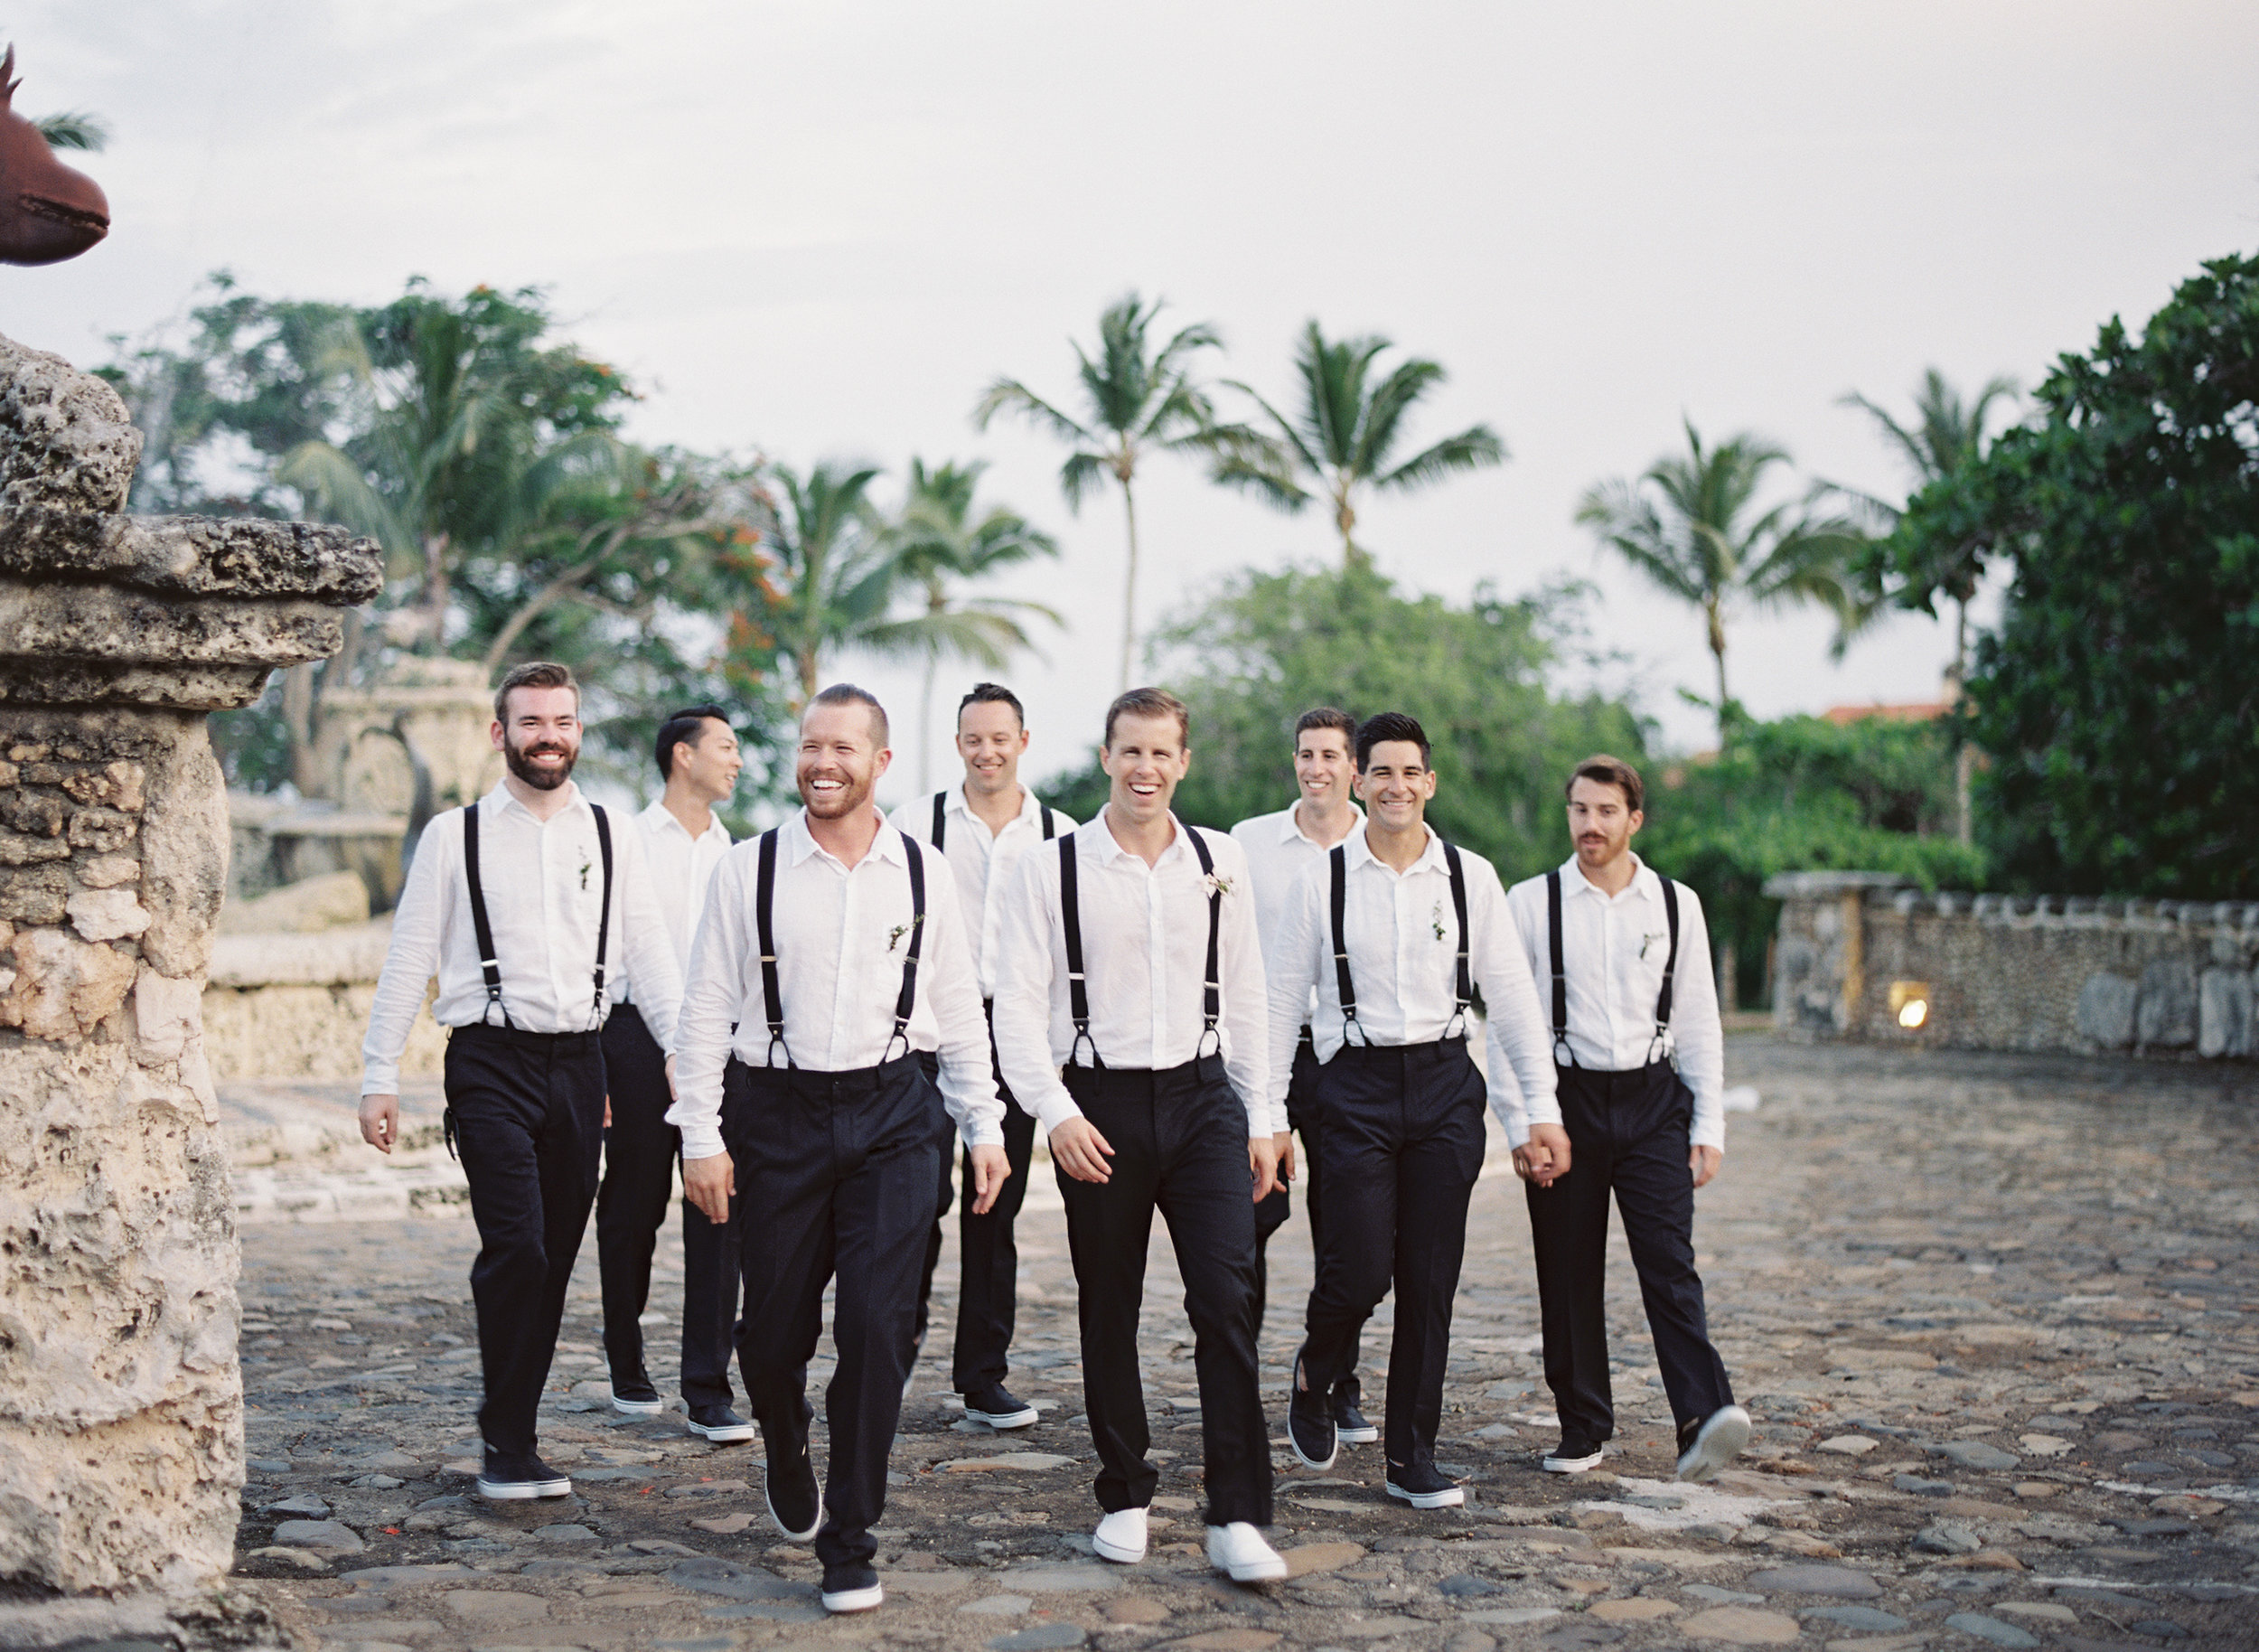 Ashleigh and Brian-Wedding Day-Carrie King Photographer-440.jpg